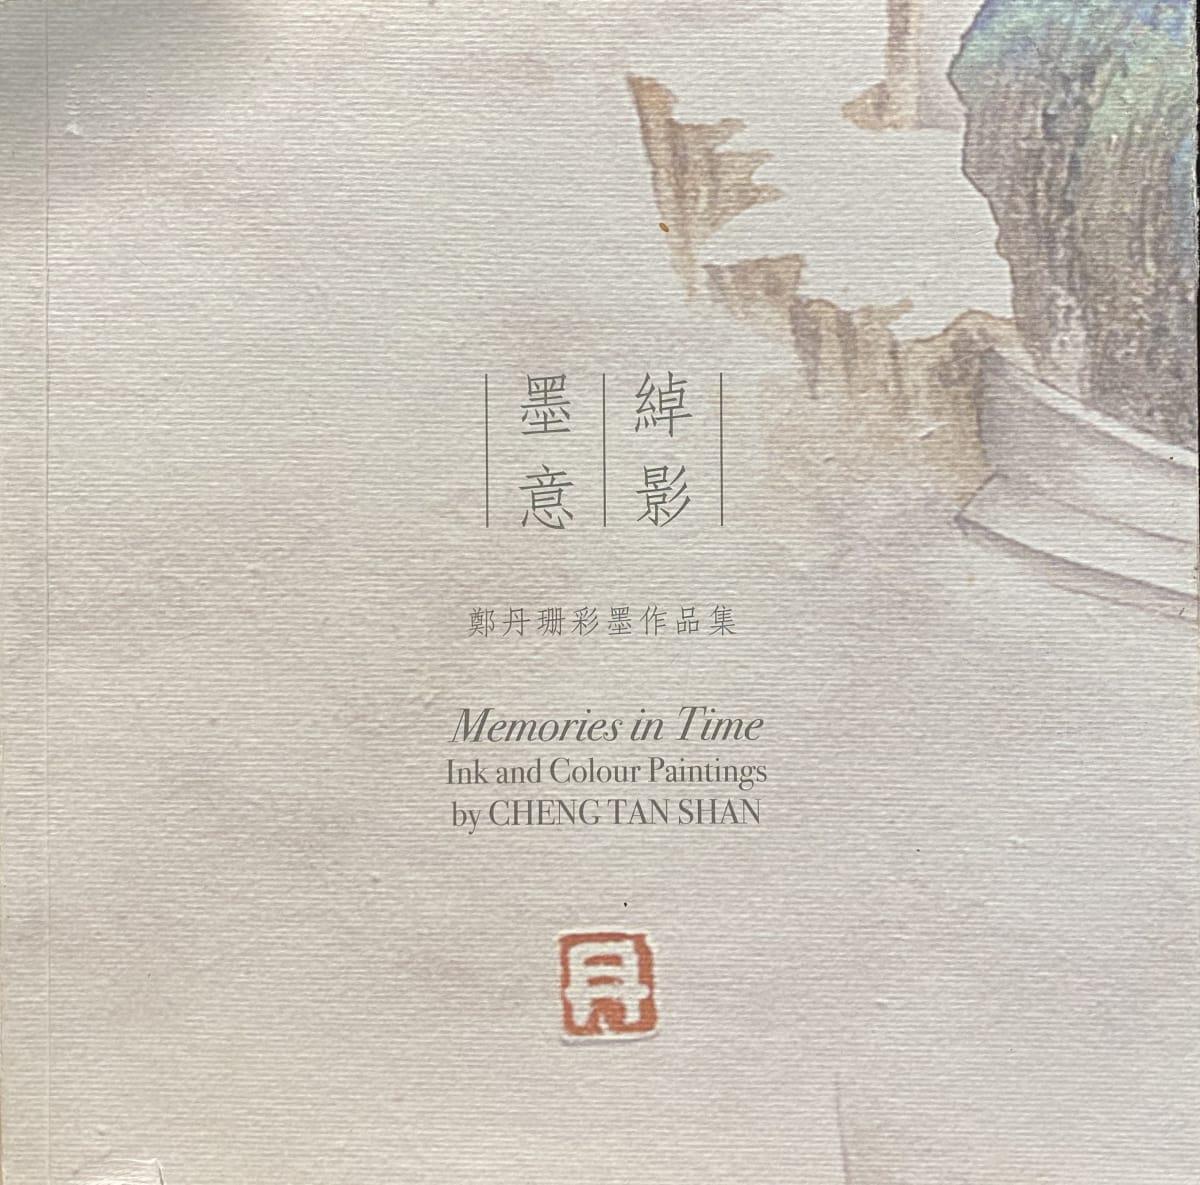 Memories in Time 綽影墨意